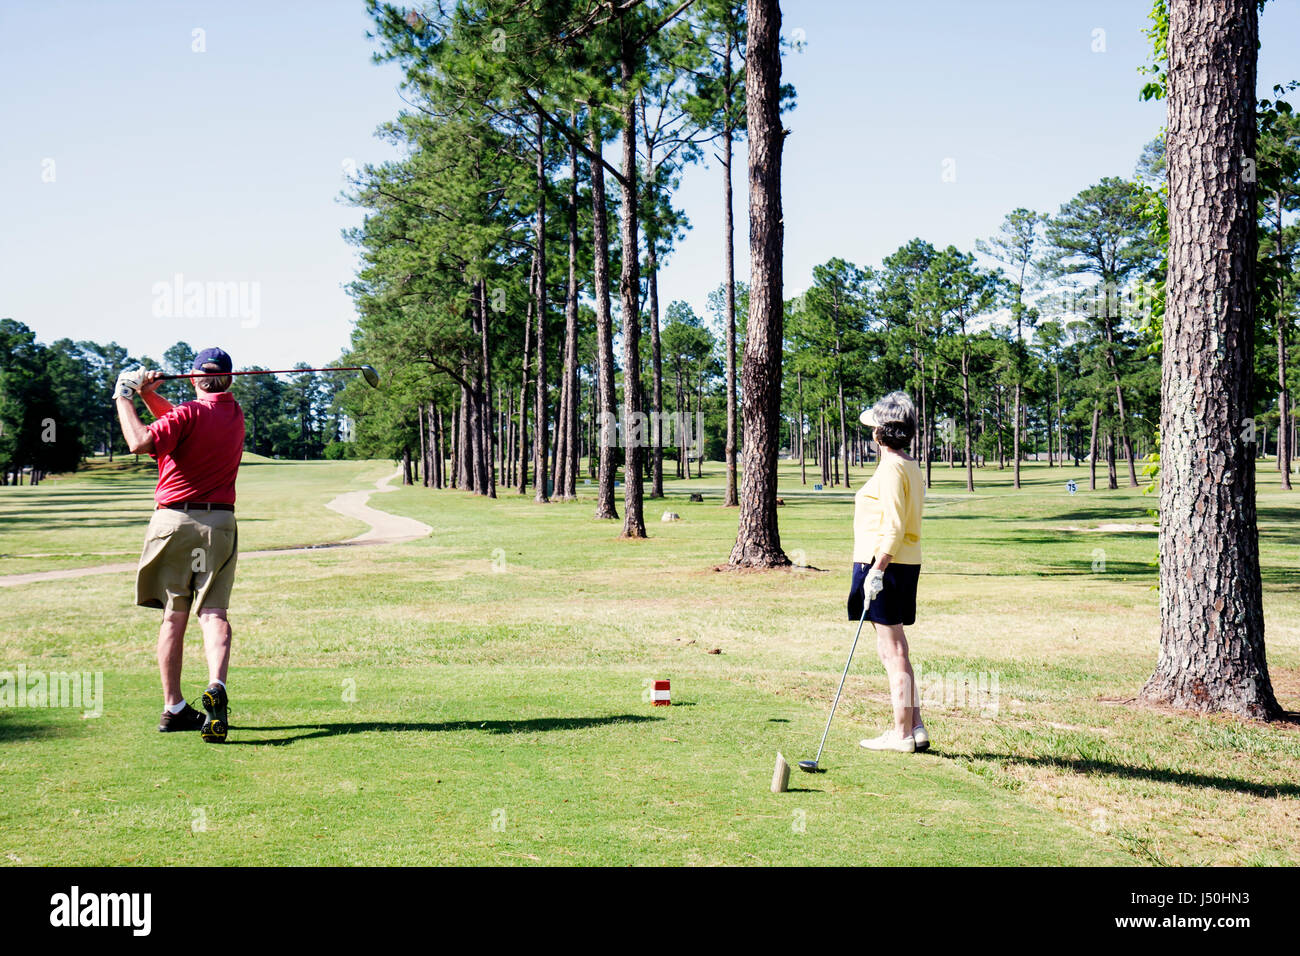 Monroeville Alabama Vanity Fair Golf and Tennis Club man woman tee off green fairway sport game recreation - Stock Image